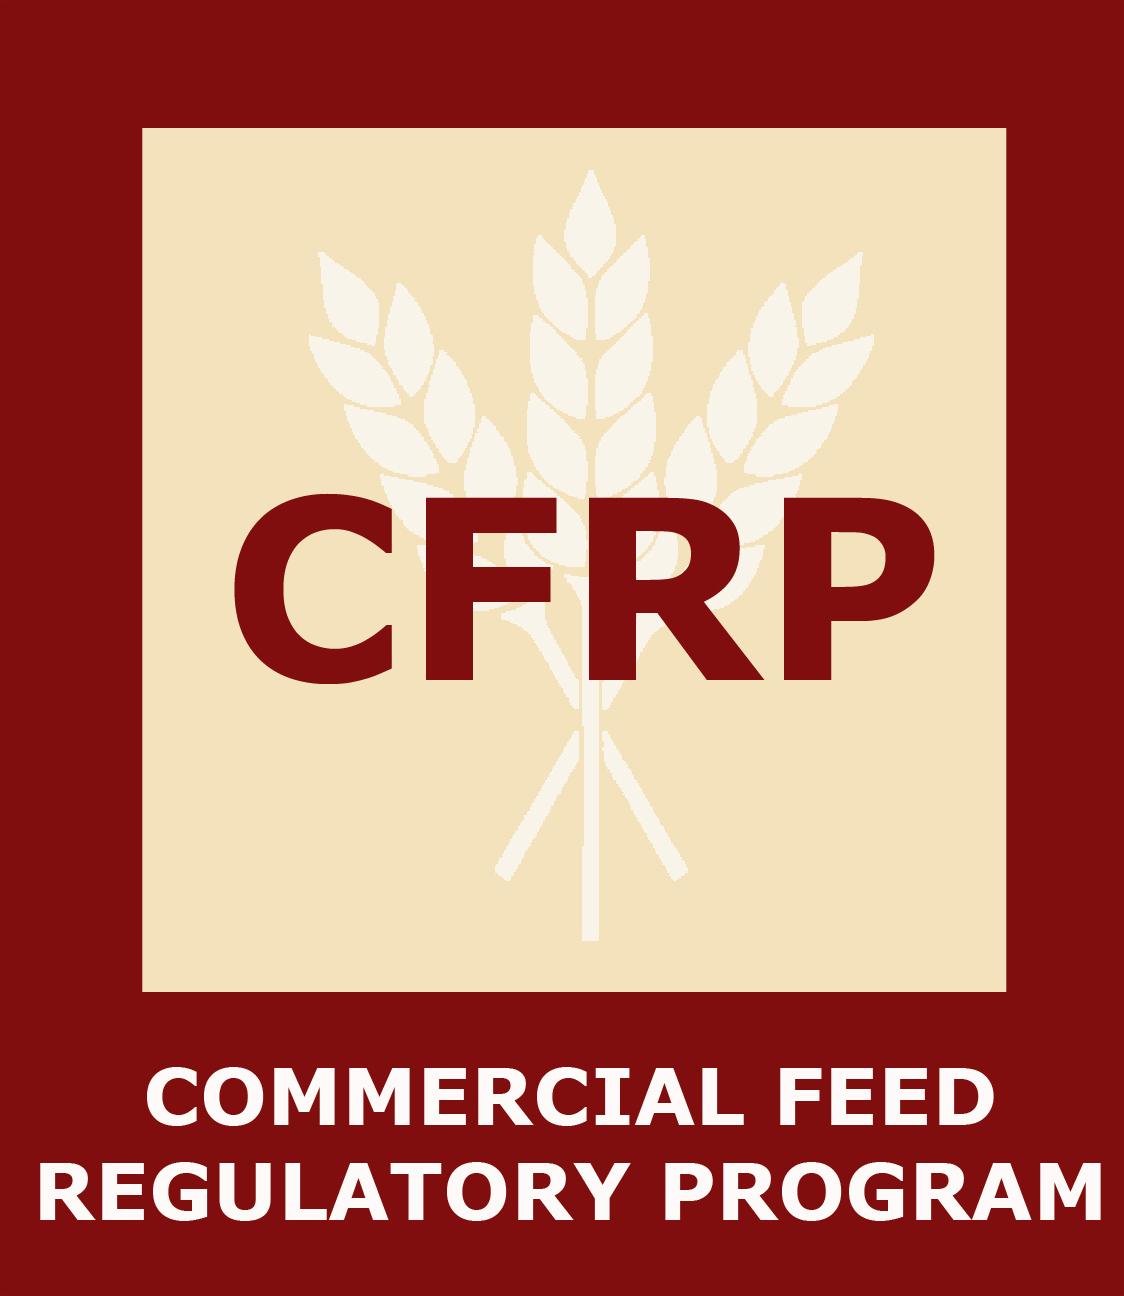 Commercial Feed Regulatory Program